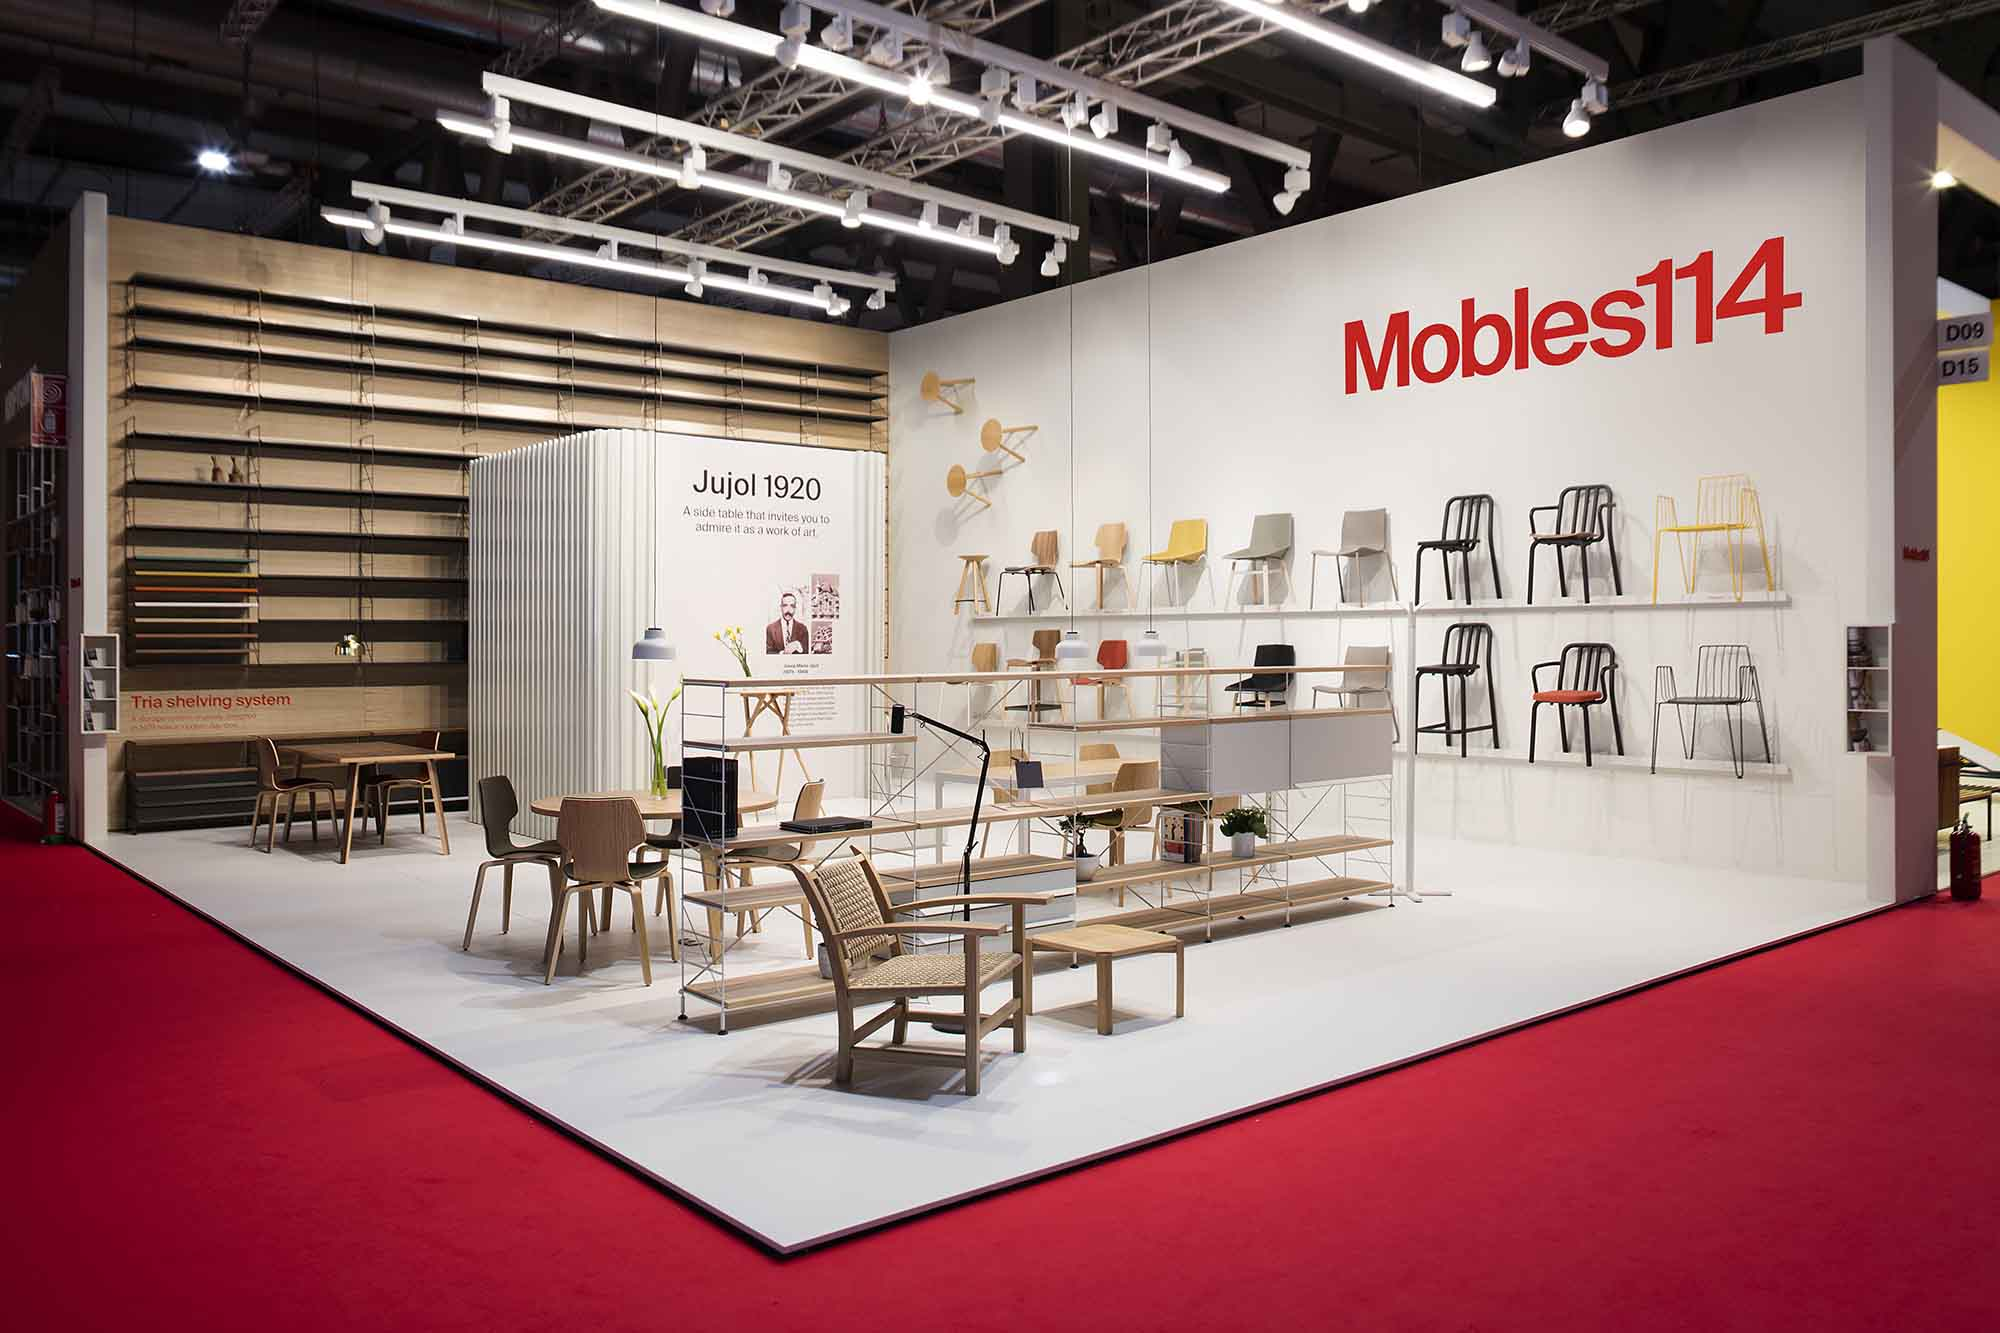 Mediolan 2019 – Mobles 114